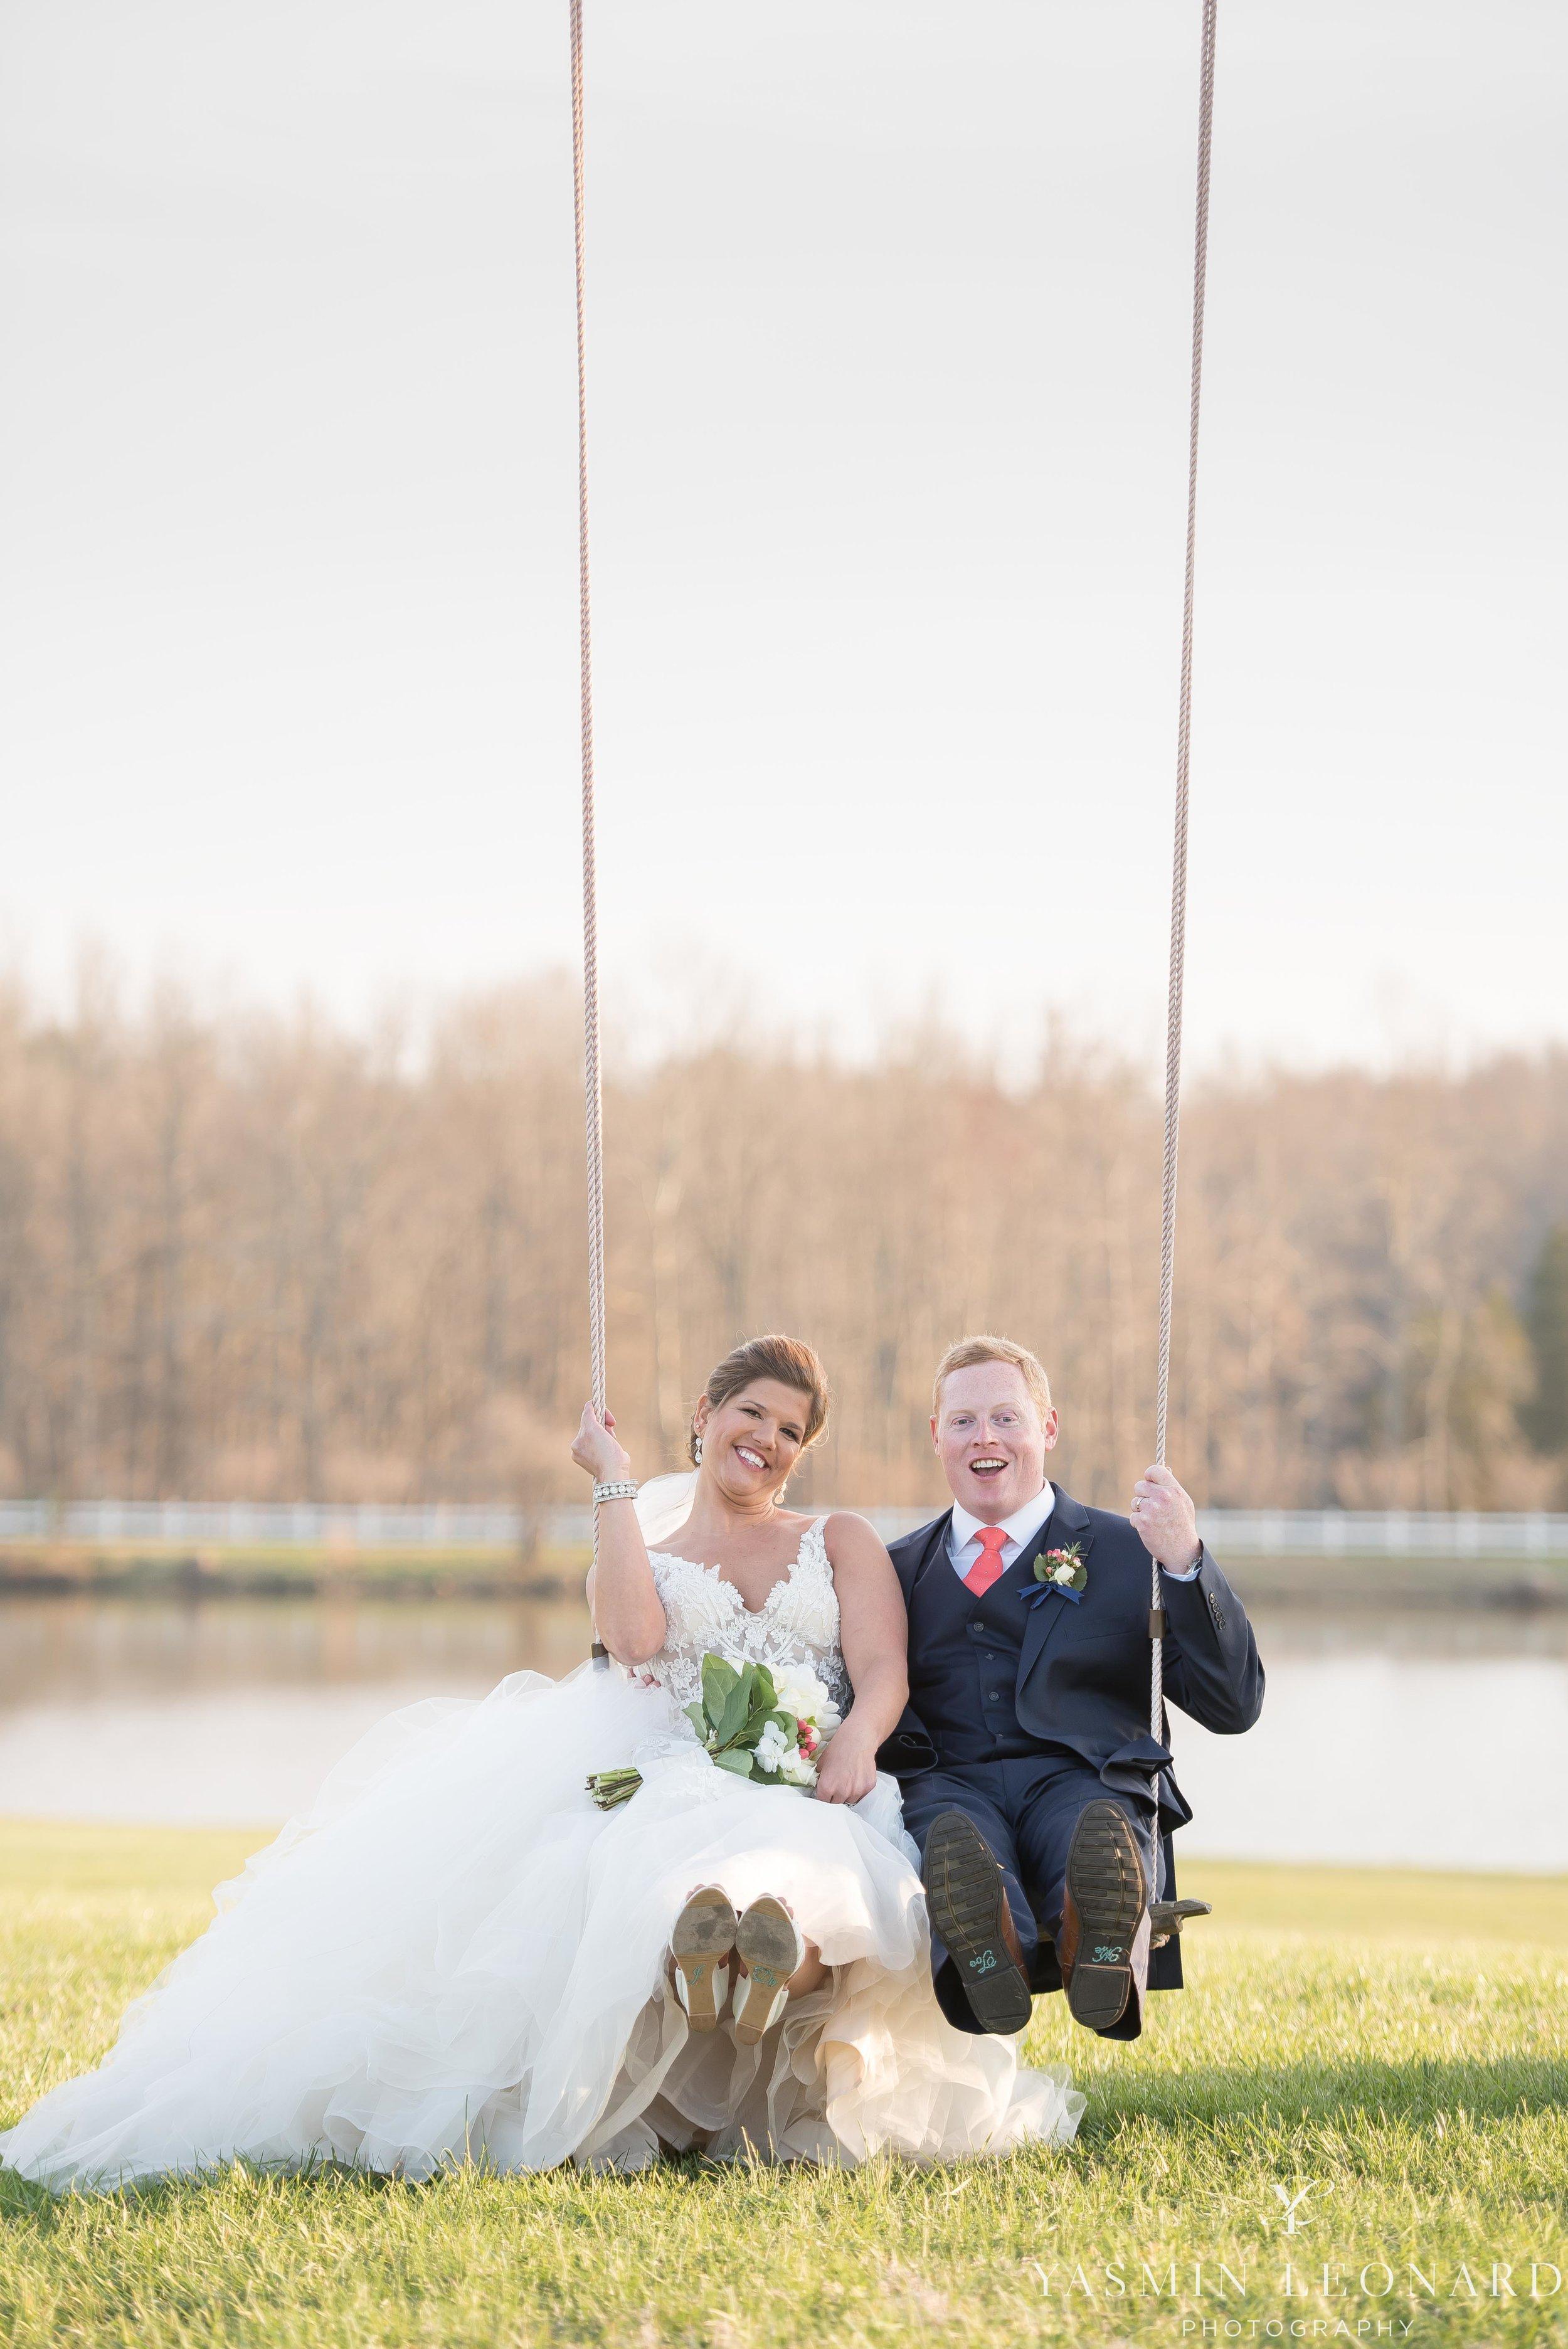 Adaumont Farm - Adaumont Farm Weddings - Trinity Weddings - NC Weddings - Yasmin Leonard Photography-54.jpg